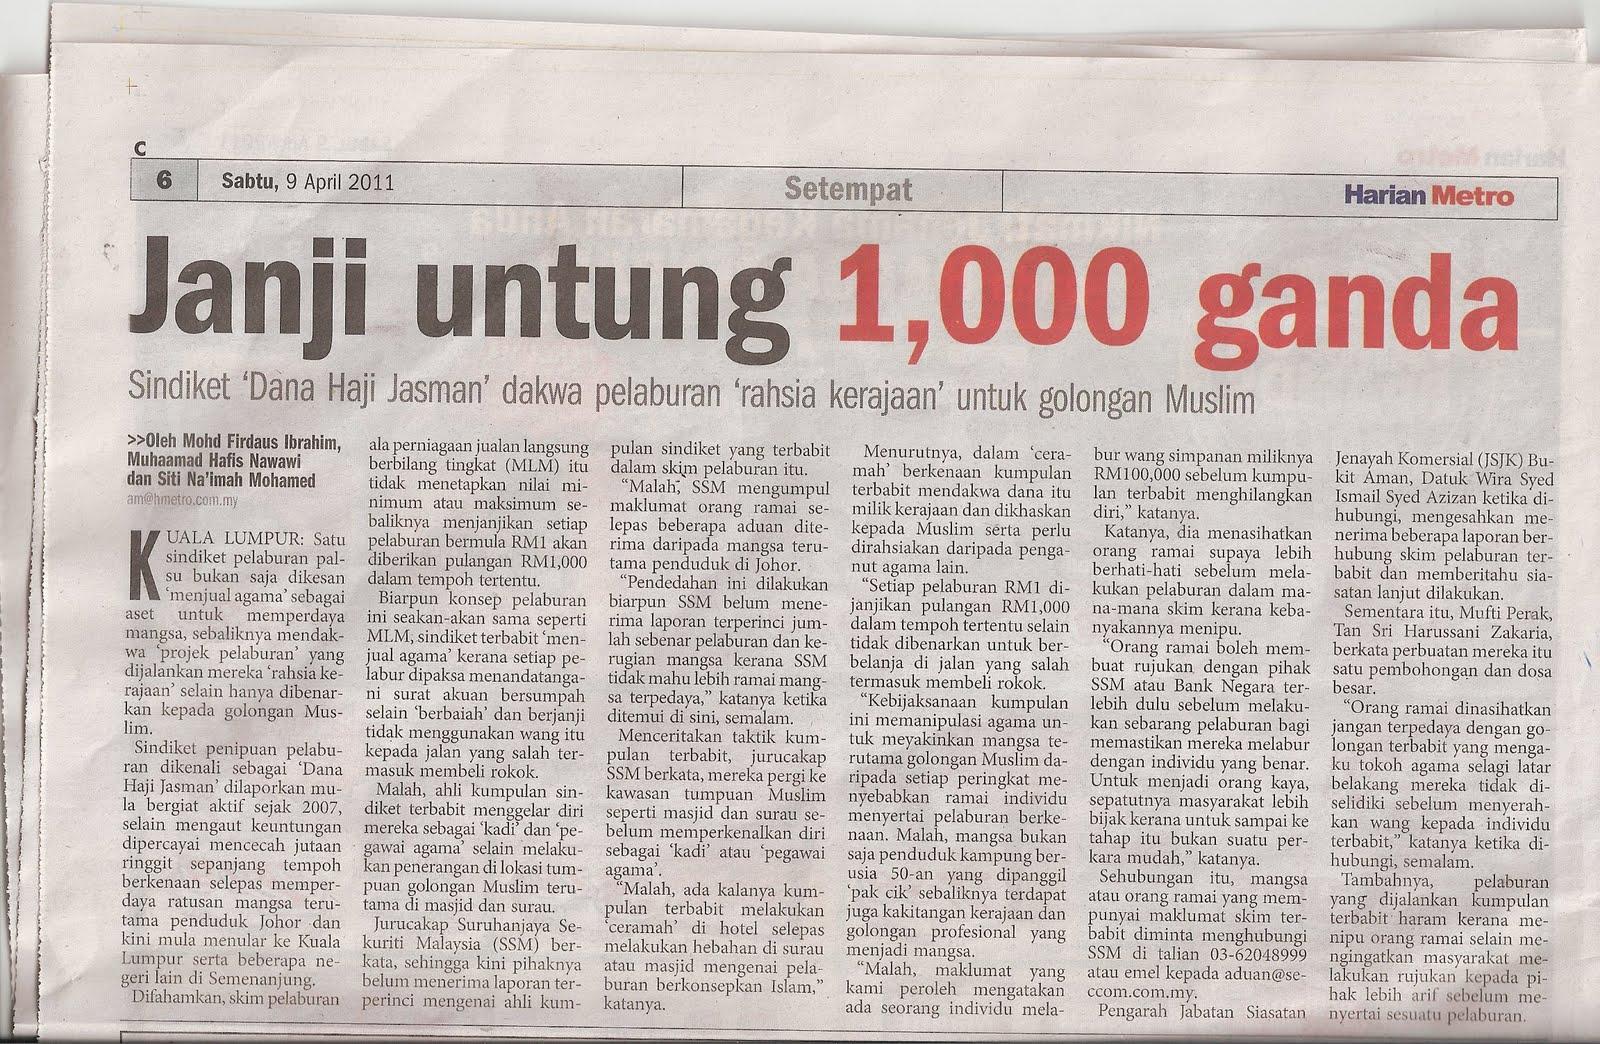 Petikan artikel Dalam Harian Metro Sabtu, 9 April 2011 oleh Mohd